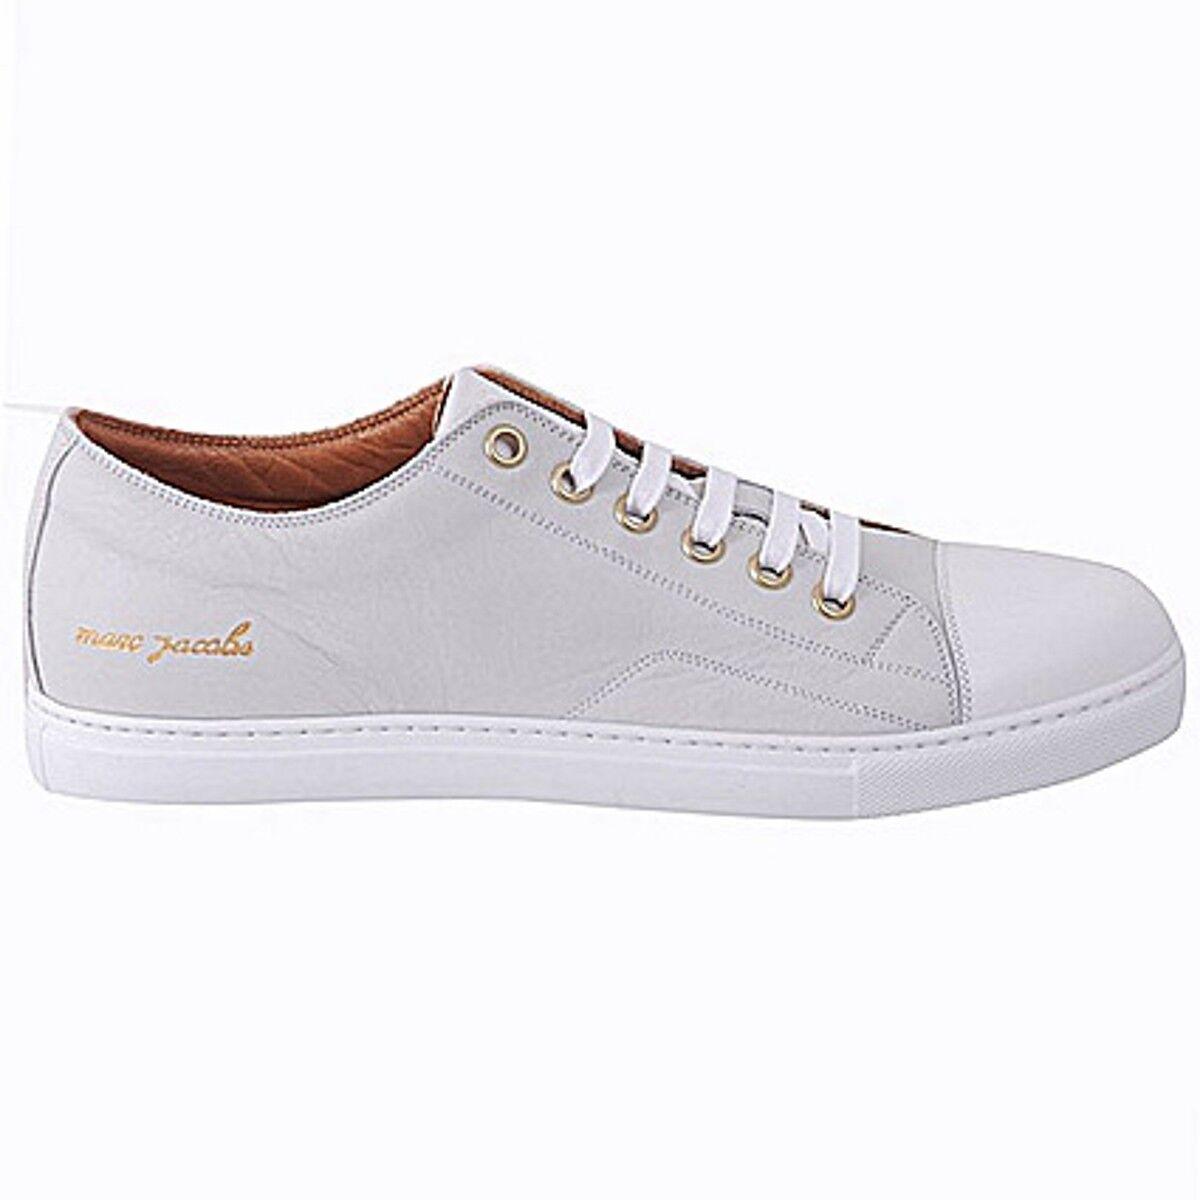 Marc Jacobs scarpe da ginnastica parker, Parker scarpe da ginnastica Dimensione 45   Il Più Economico    Uomini/Donna Scarpa